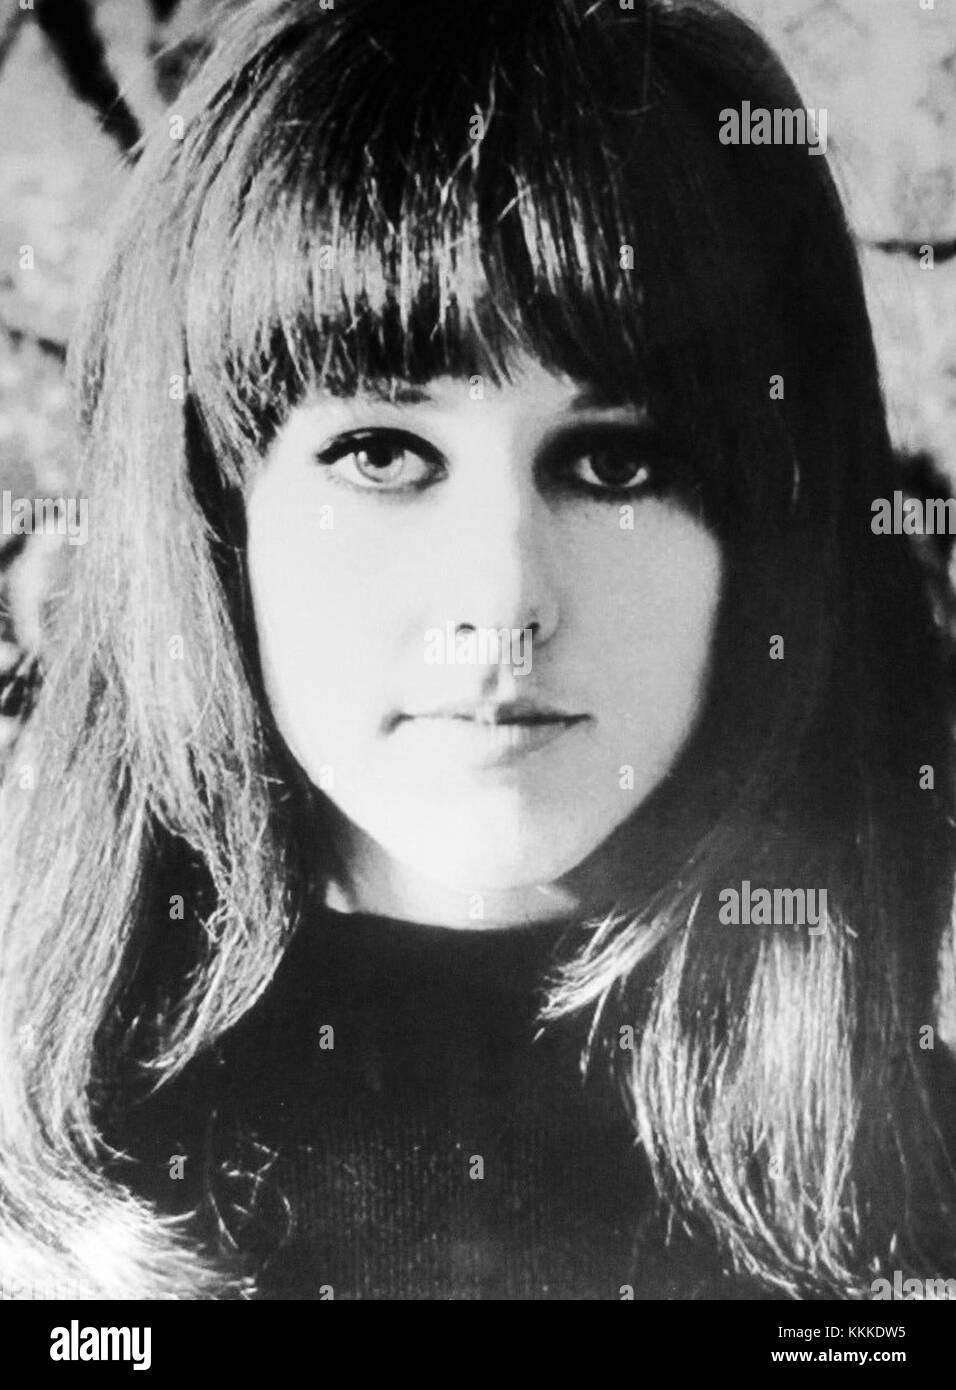 Grace Slick ca. 1967 - Stock Image